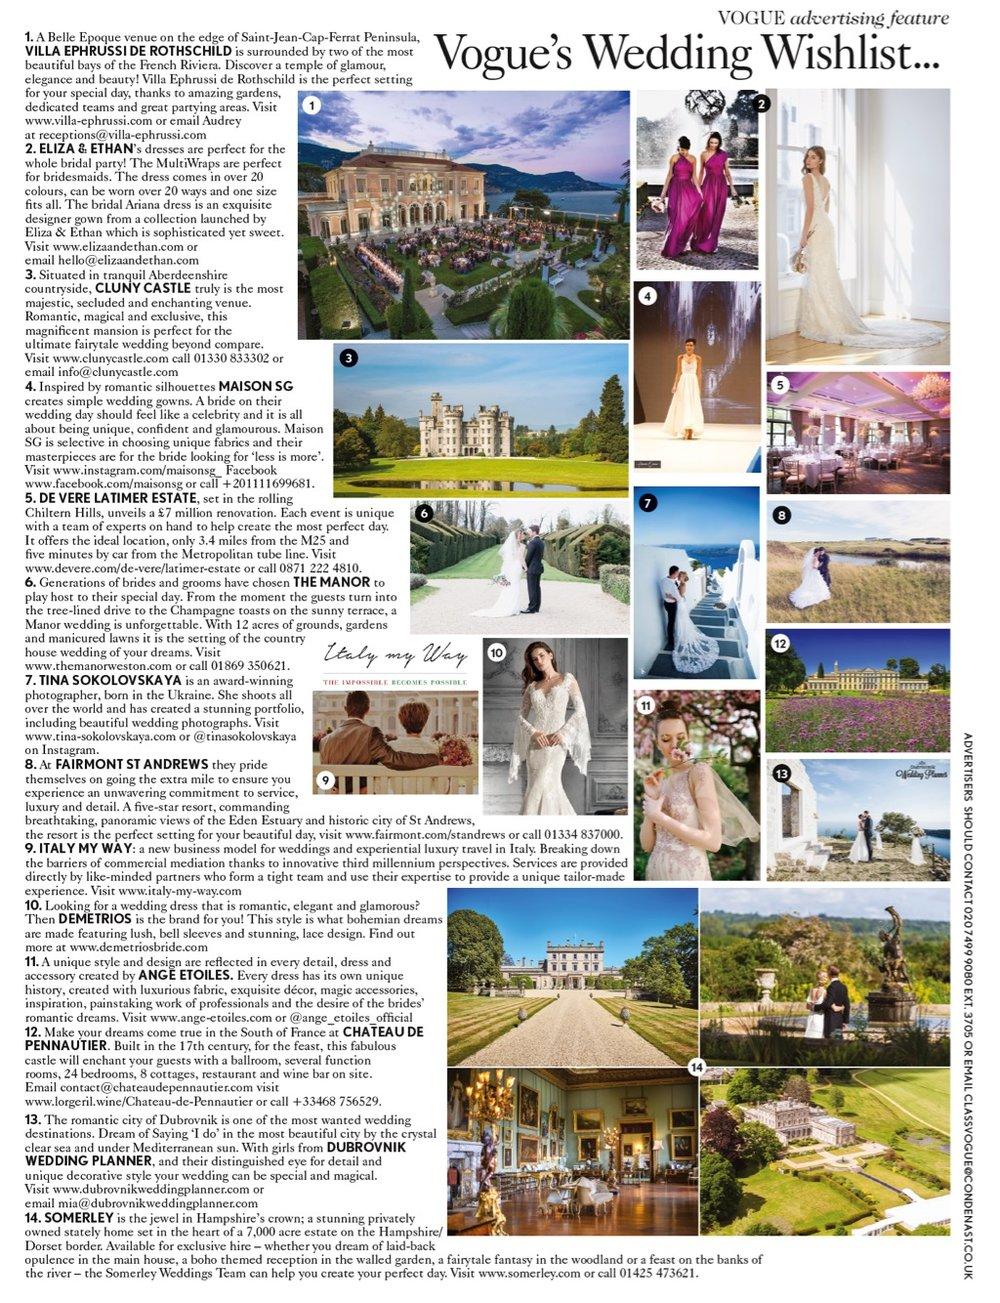 DWP Vogue Magazine Wish List September.JPG